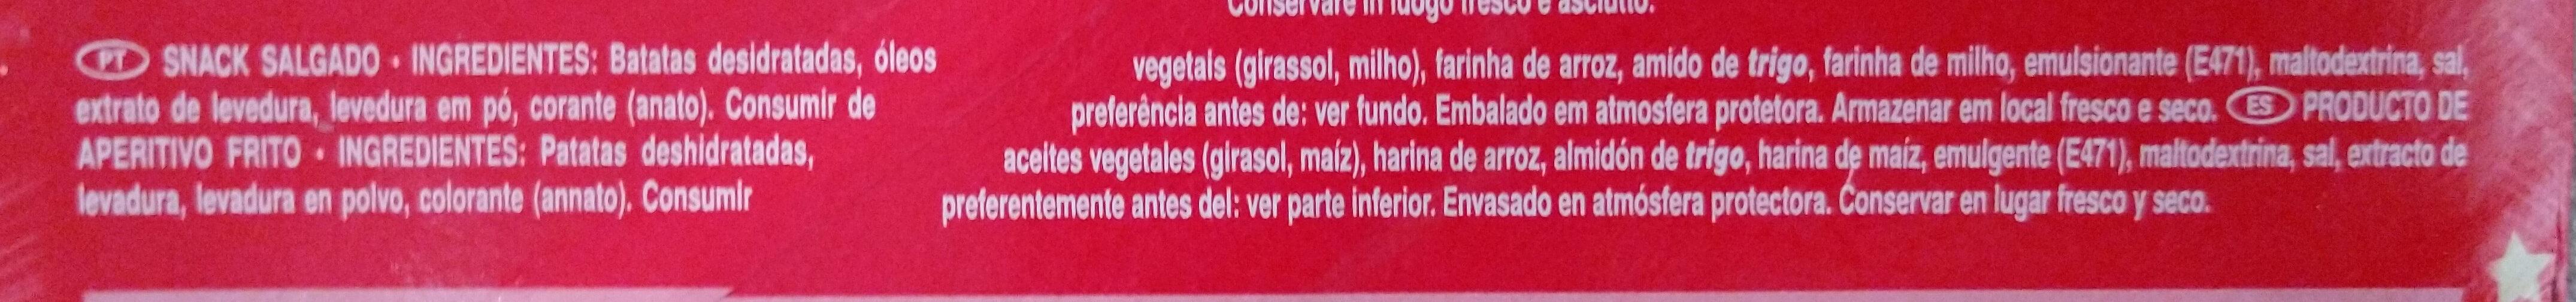 Pringles Original - Ingredientes - pt